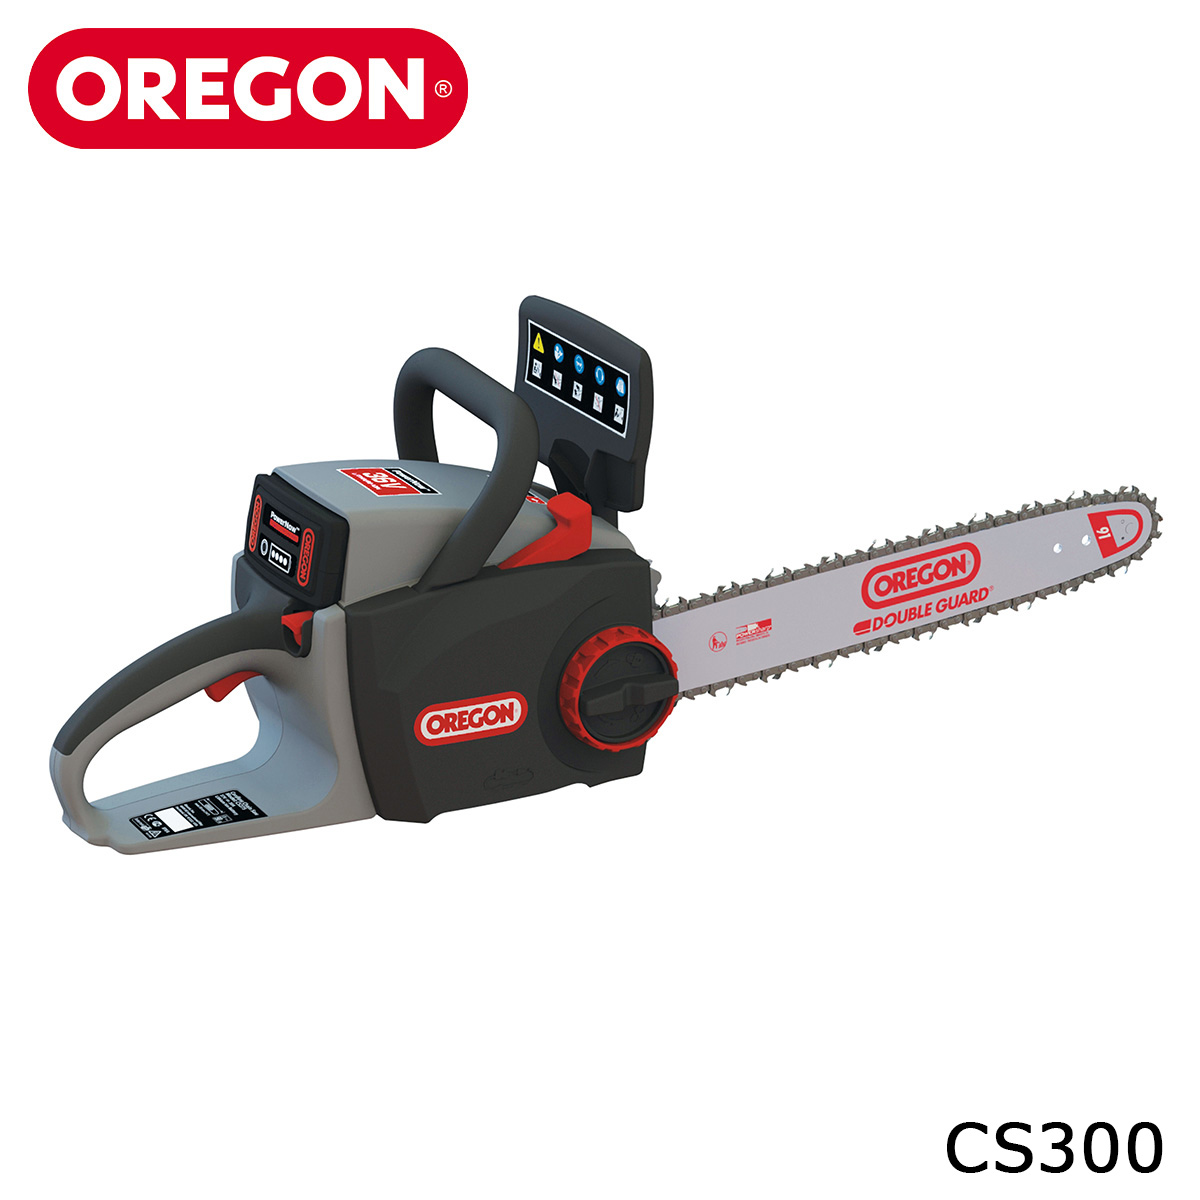 OREGON CS300 CTS 電動チェンソー バッテリー式 コードレス 自動目立て機能 低騒音 16インチ 40cm チェーンソー オレゴン【本体のみ】